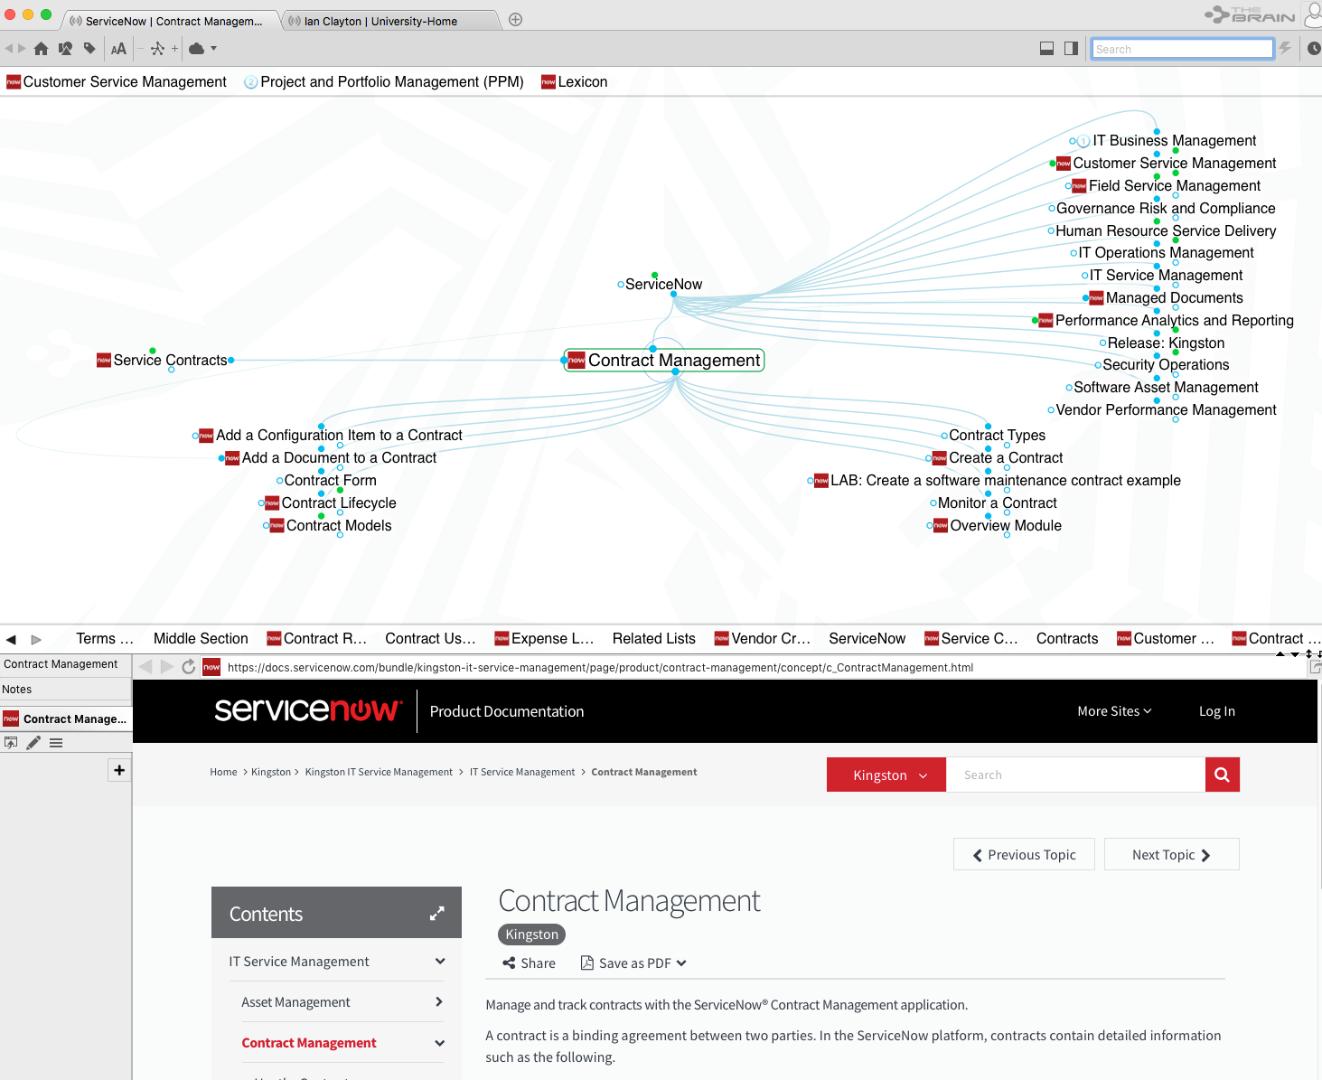 Click image for larger version - Name: Example-URL-via-Desktop-3.png, Views: 56, Size: 413.58 KB